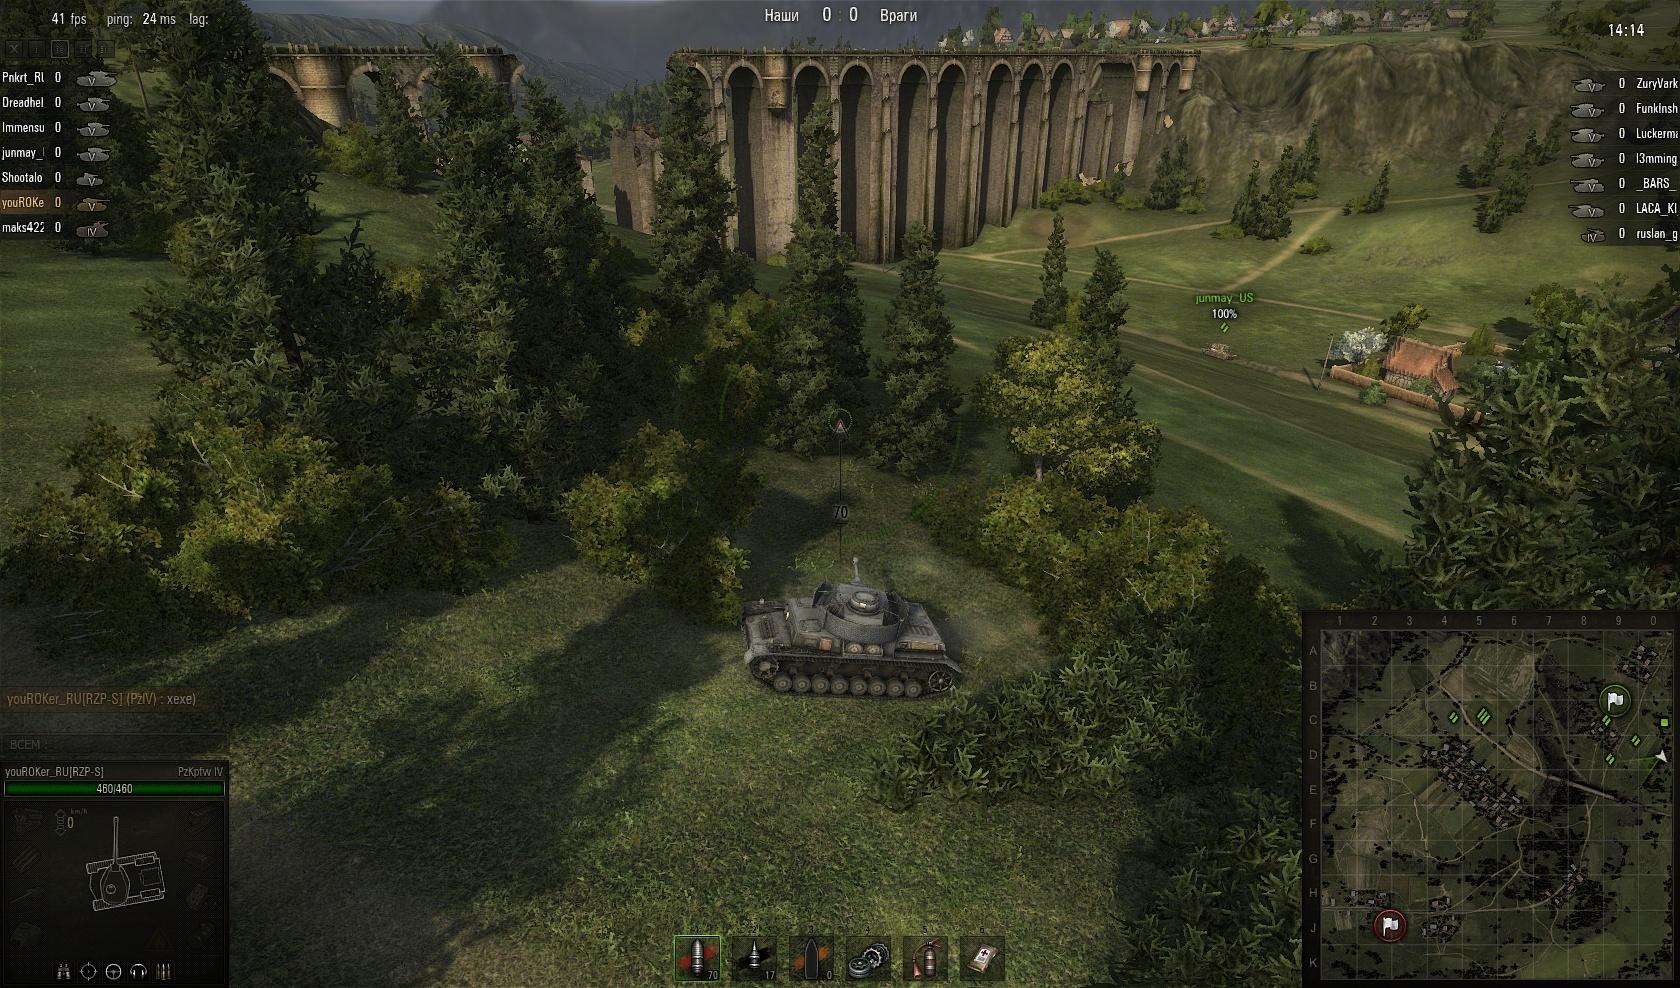 world of tanks 2017 codes